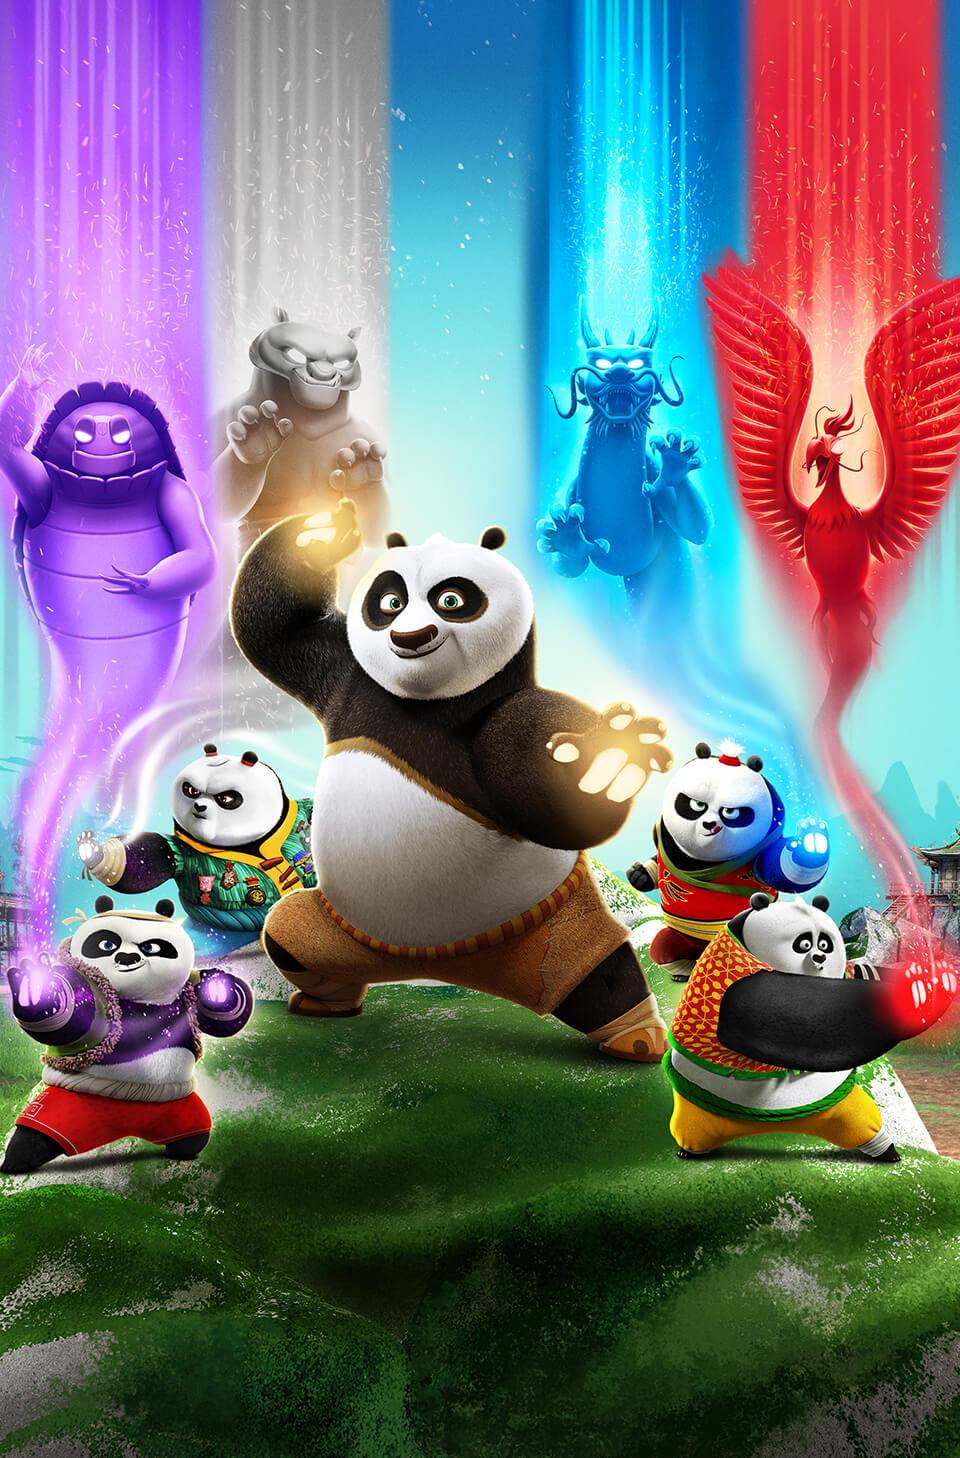 kung fu panda 3 full movie in hindi download 720p worldfree4u